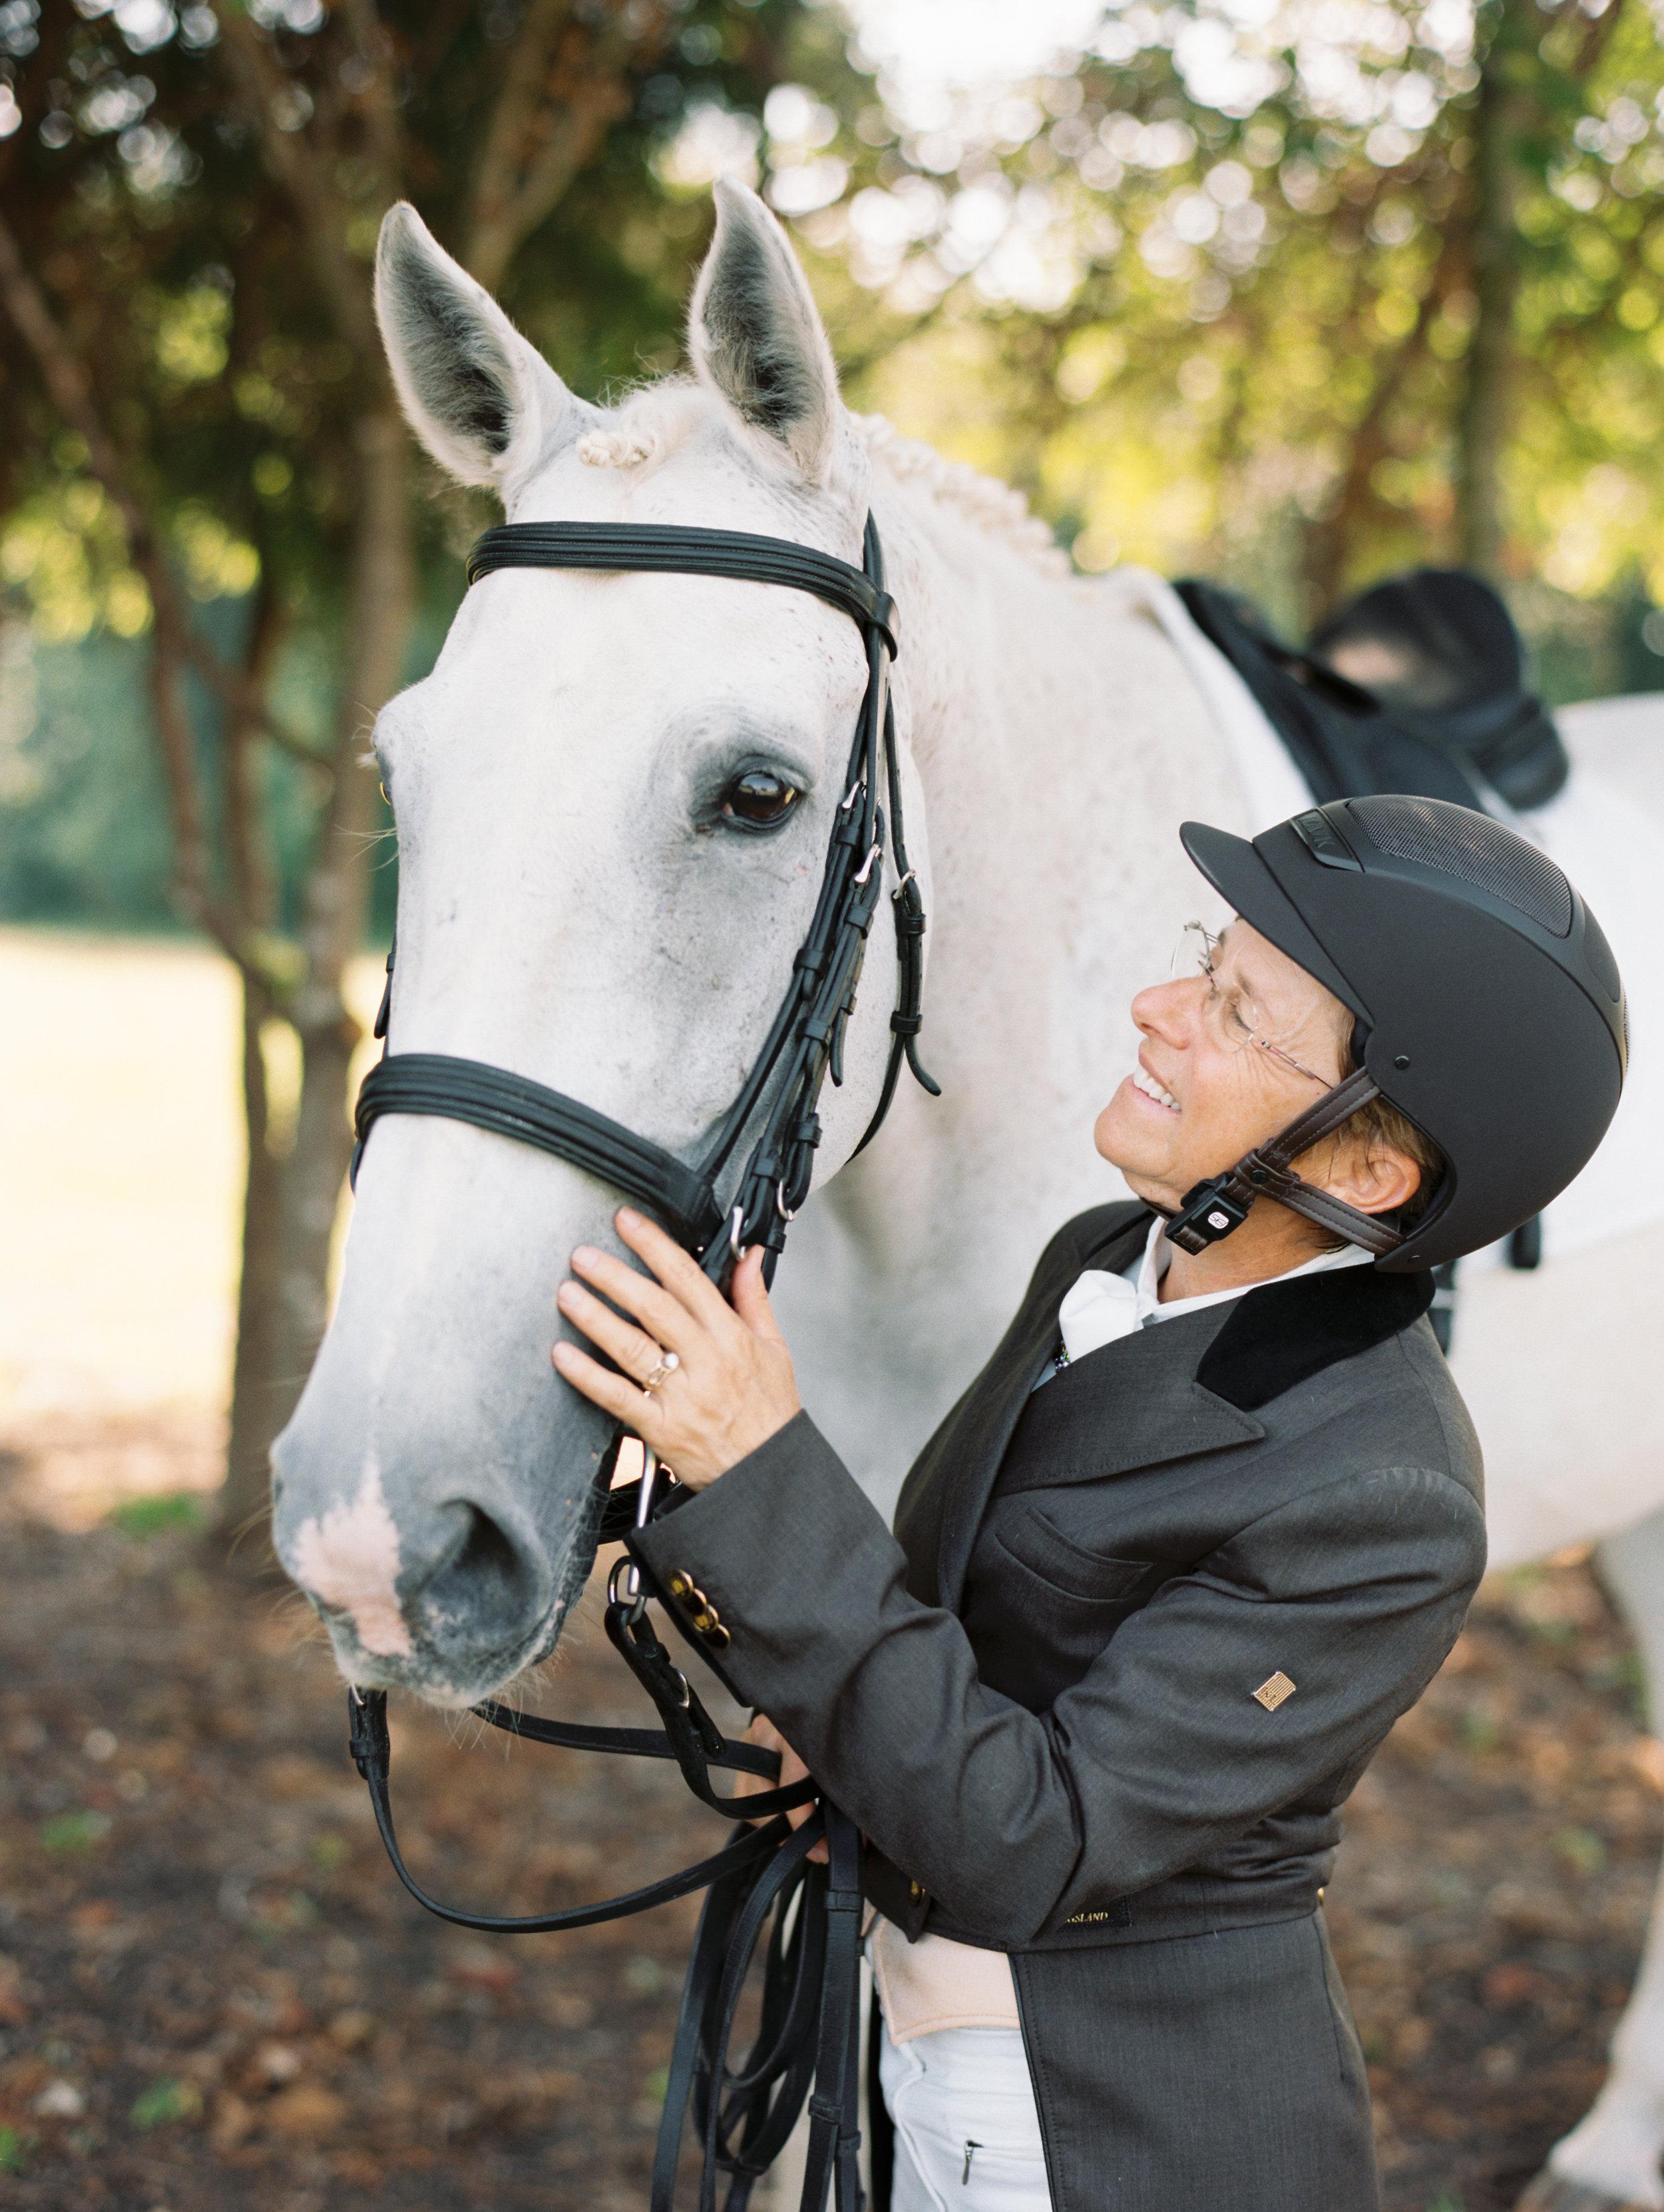 wilmer-texas-becky-brown's-school-of-horsemanship-ar-photography-becky-49.jpg